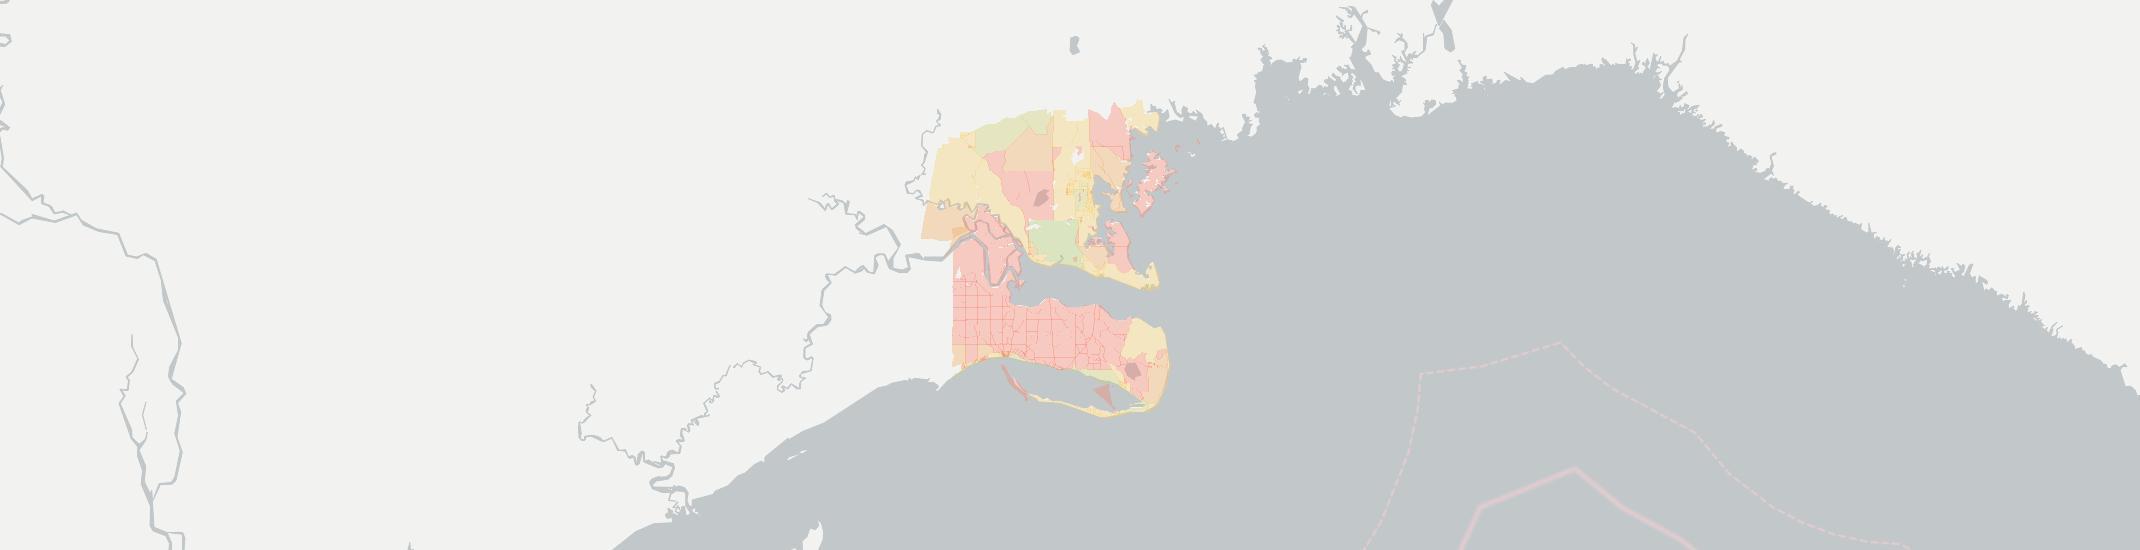 Panacea Florida Map.Internet Providers In Panacea Compare 11 Providers